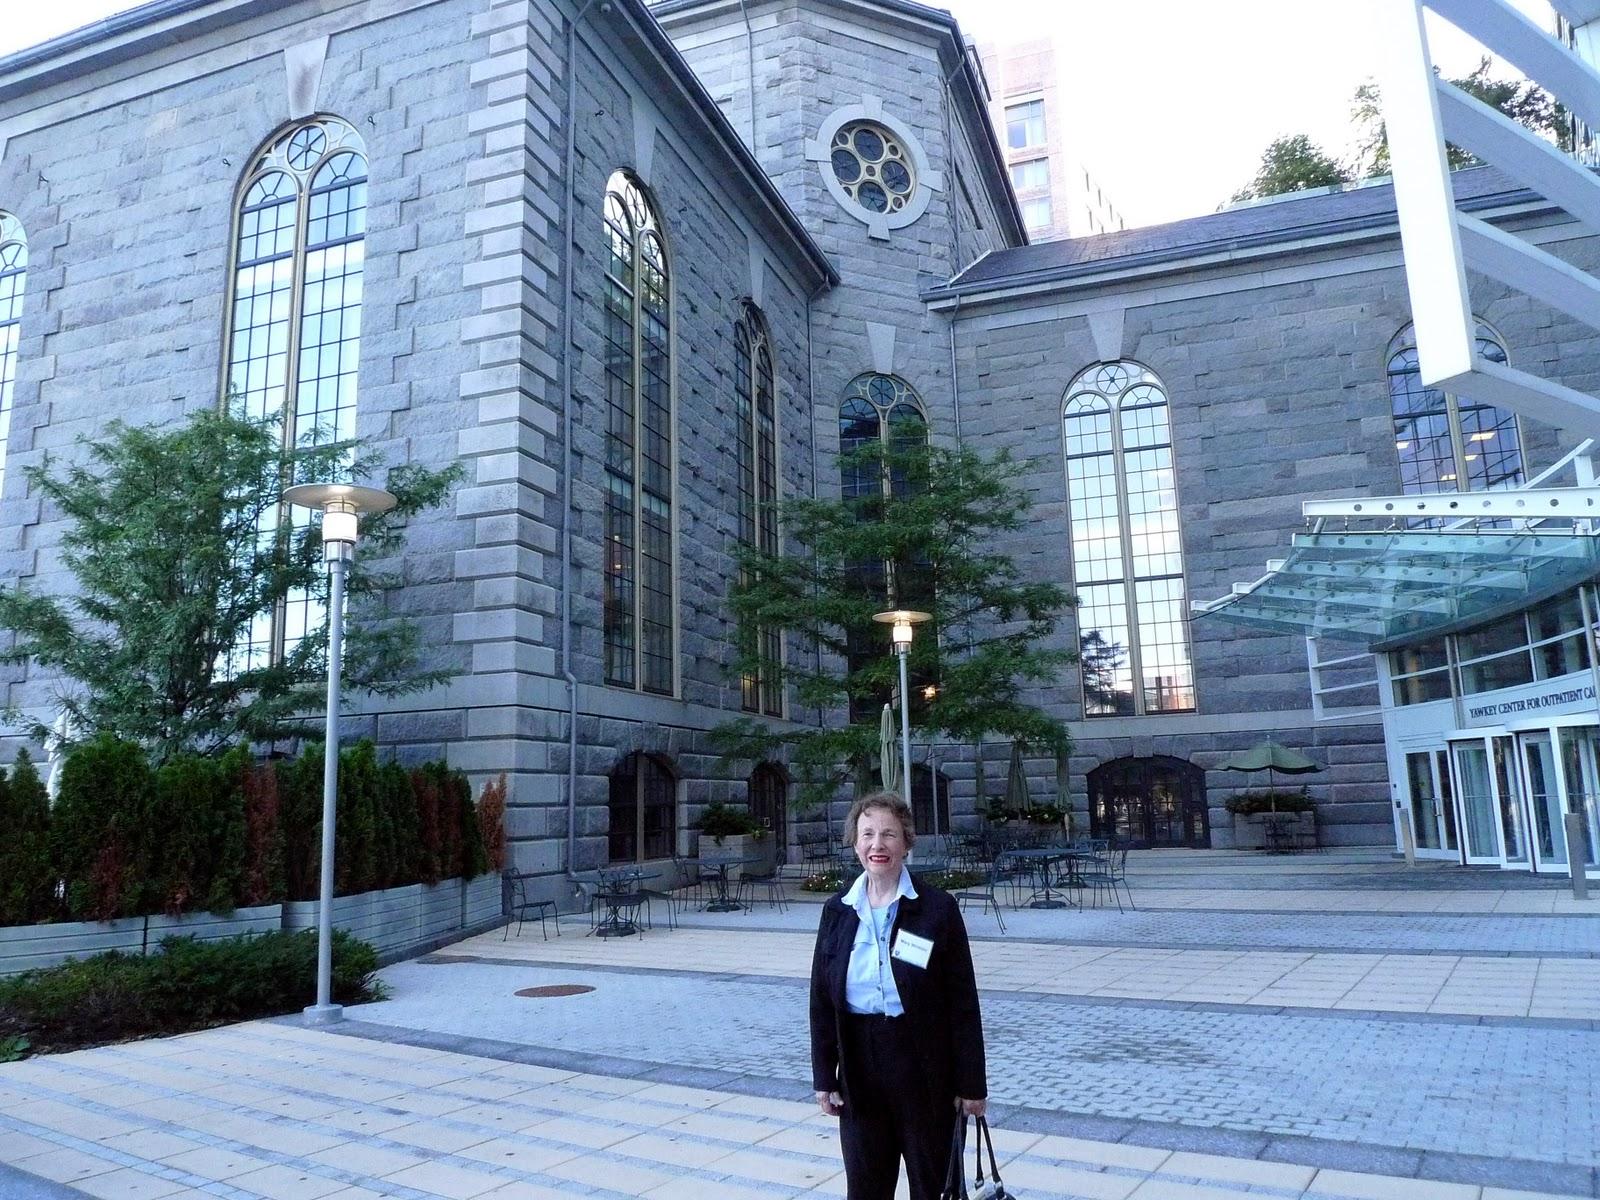 Dad's Blog: SURGICAL REUNION MASSACHUSETTS GENERAL HOSPITAL